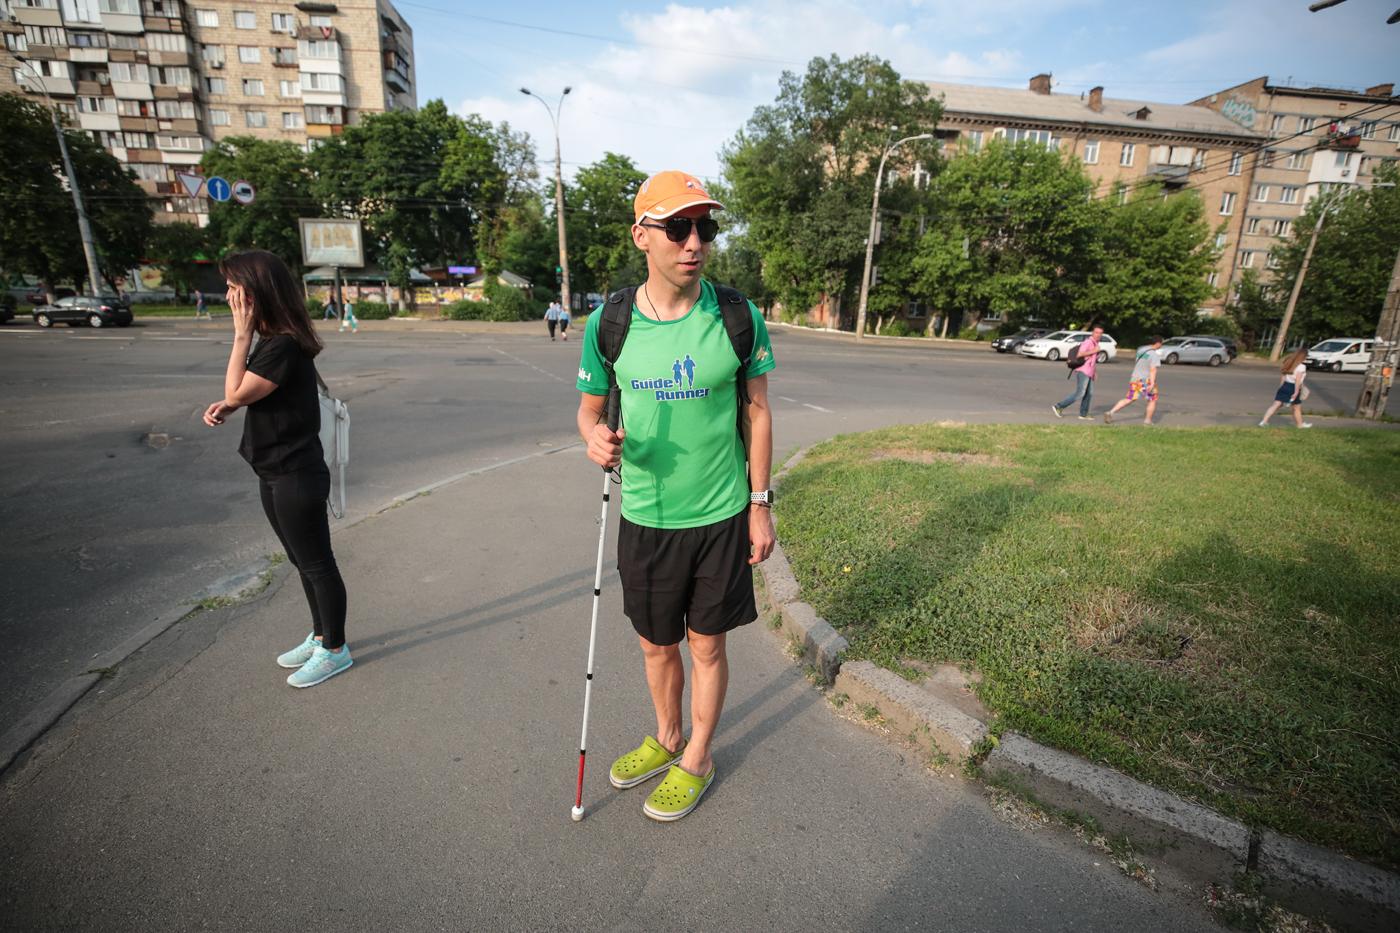 Біговий клуб Guide Runner: навчитися бачити за двох